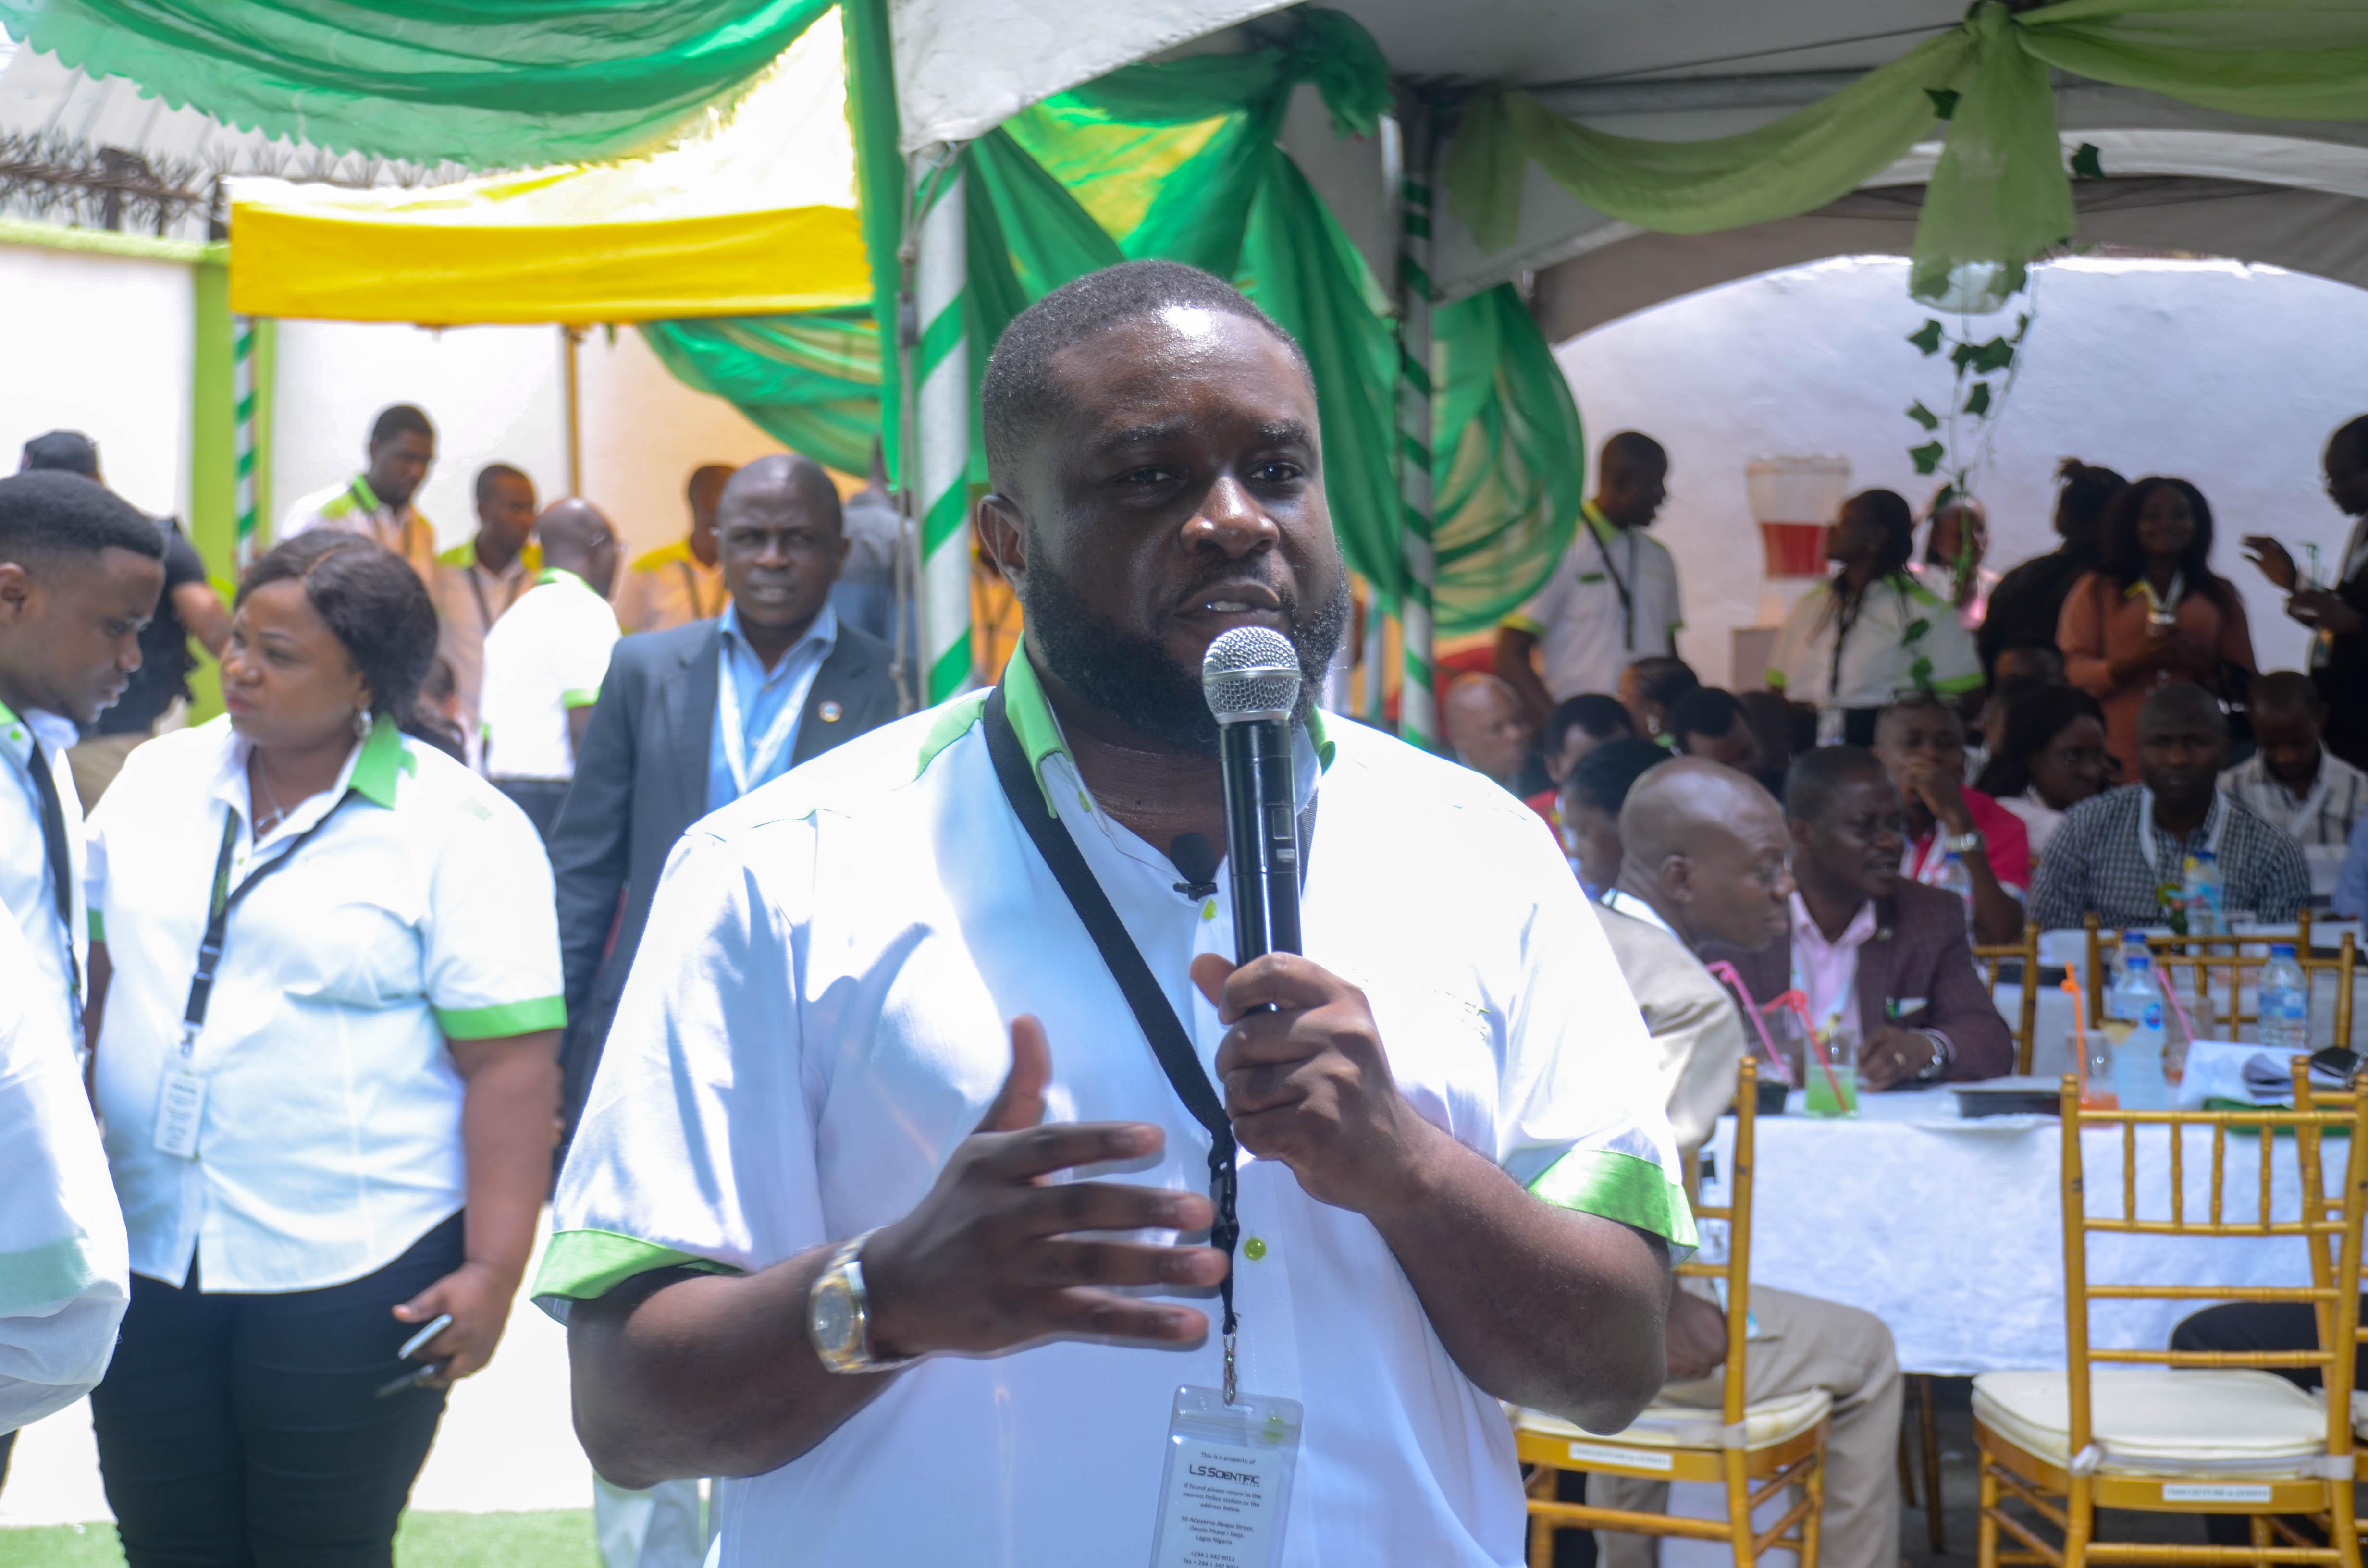 LS Scientific: Olumurewa Odunjo Speaks On World Class Laboratory Launch In Nigeria